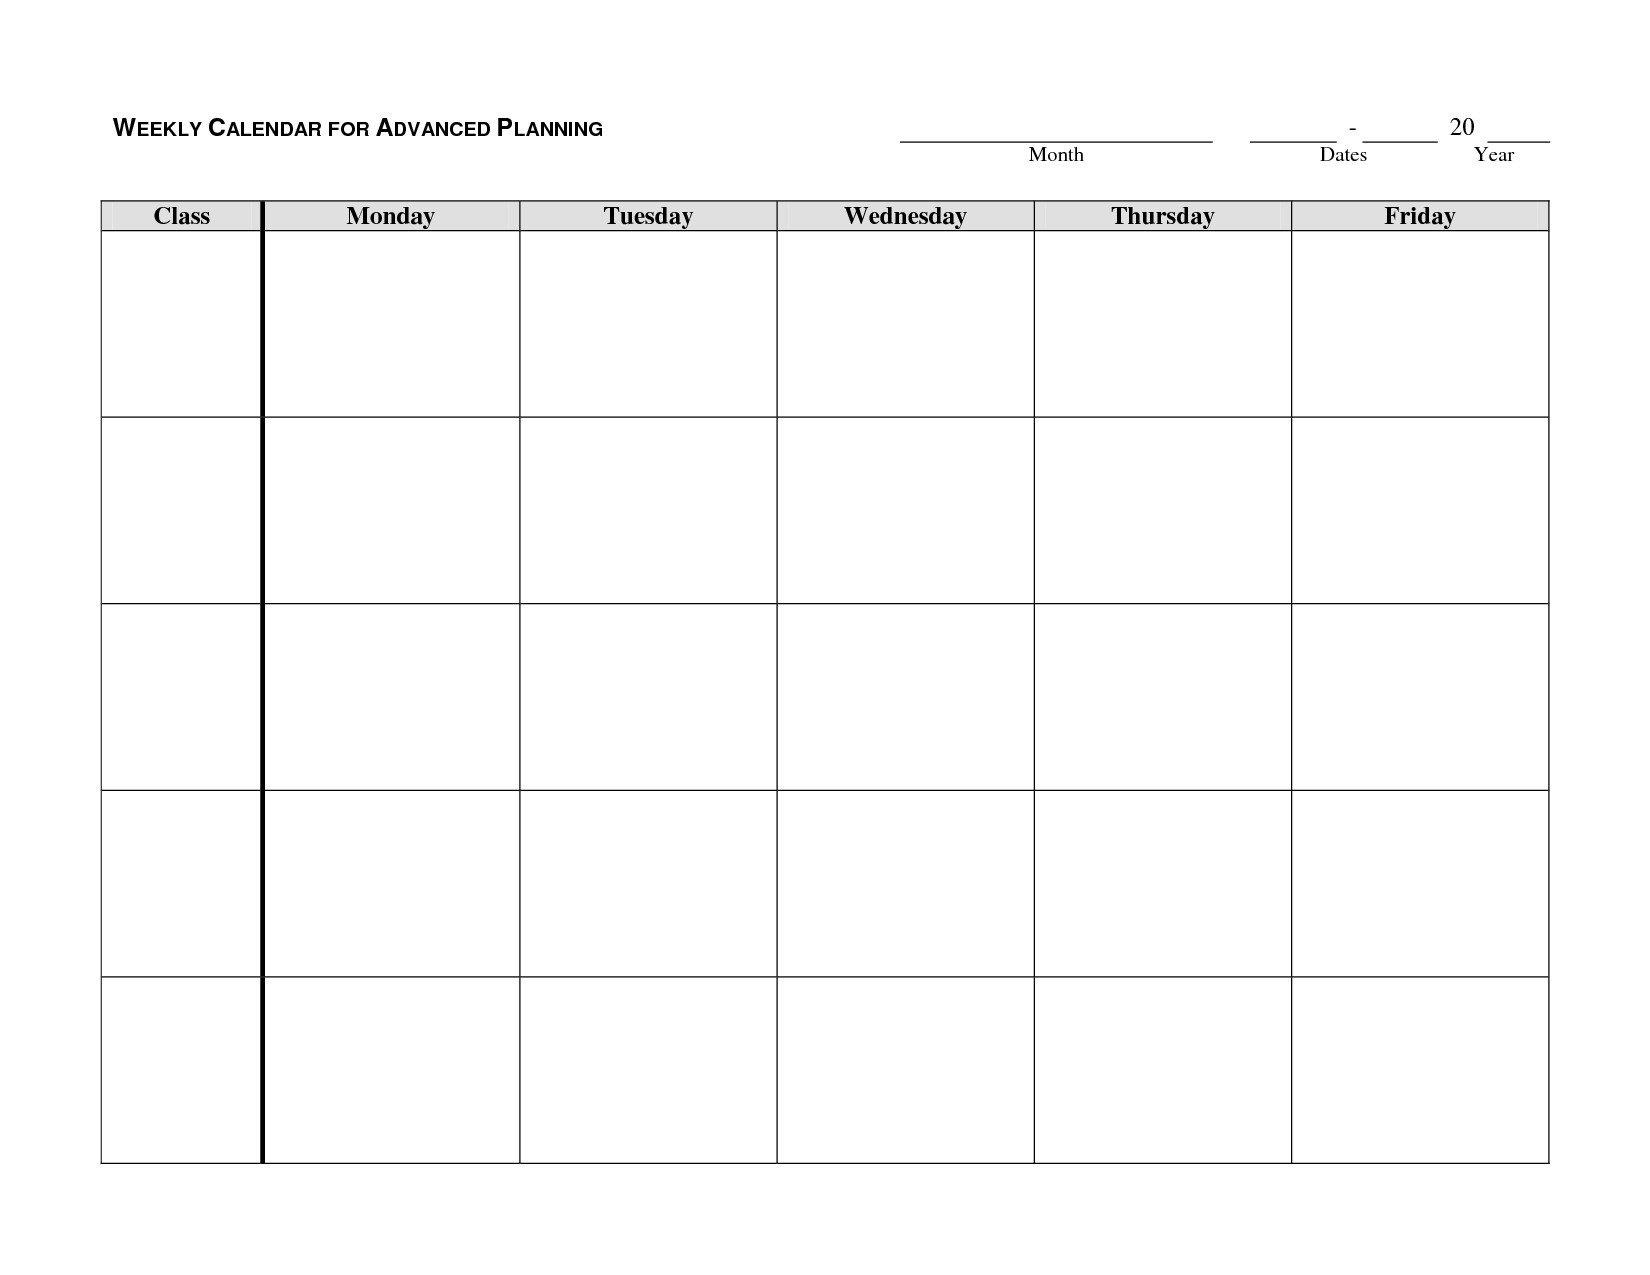 Monday-Friday Blank Weekly Schedule   Calendar Template Monday Thru Friday Calender